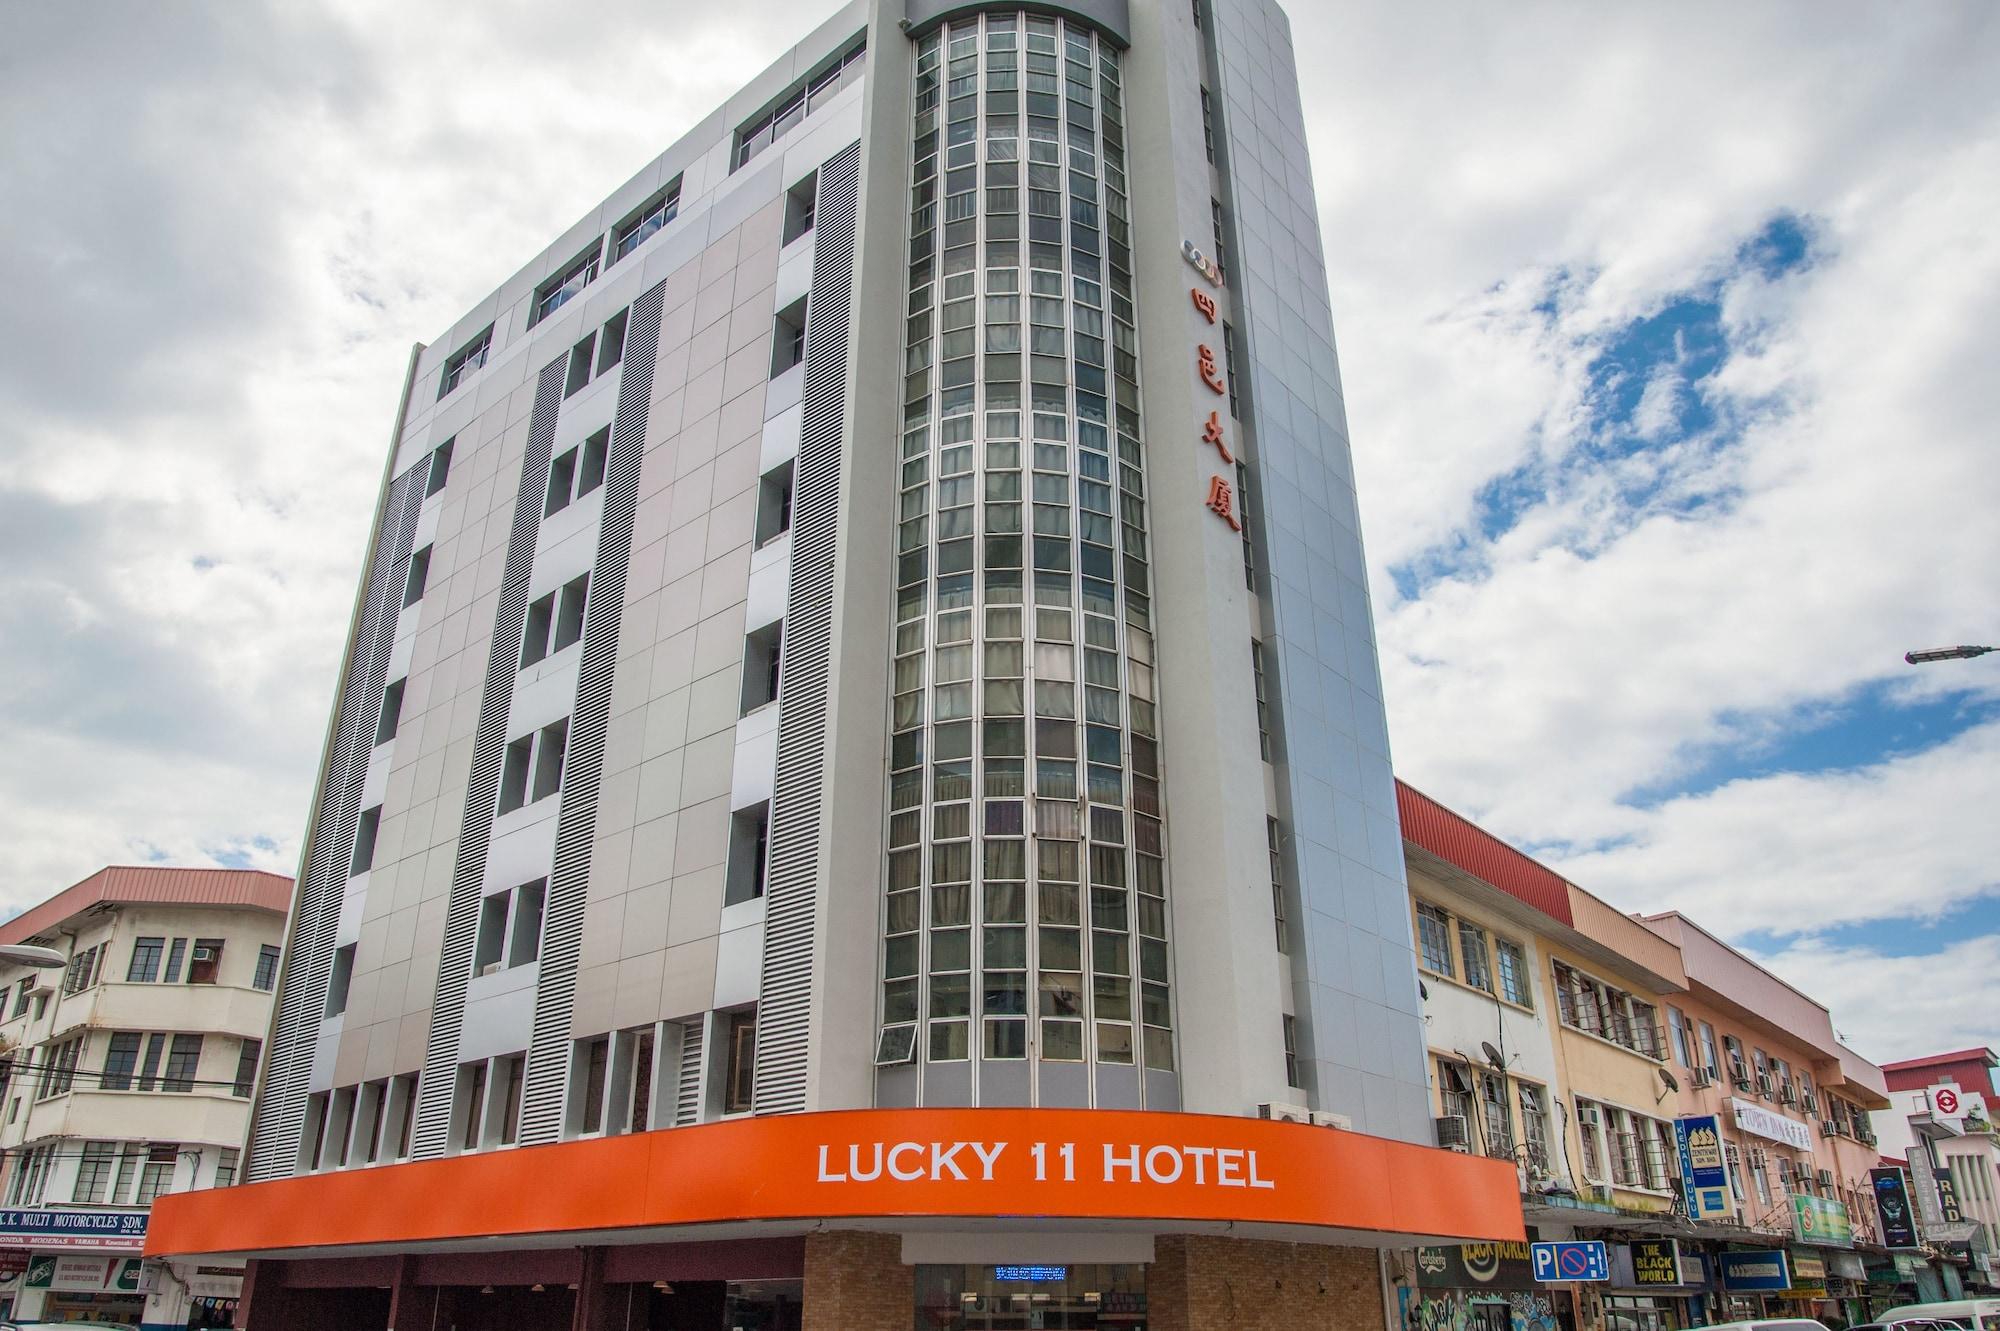 Lucky 11 Hotel, Kota Kinabalu